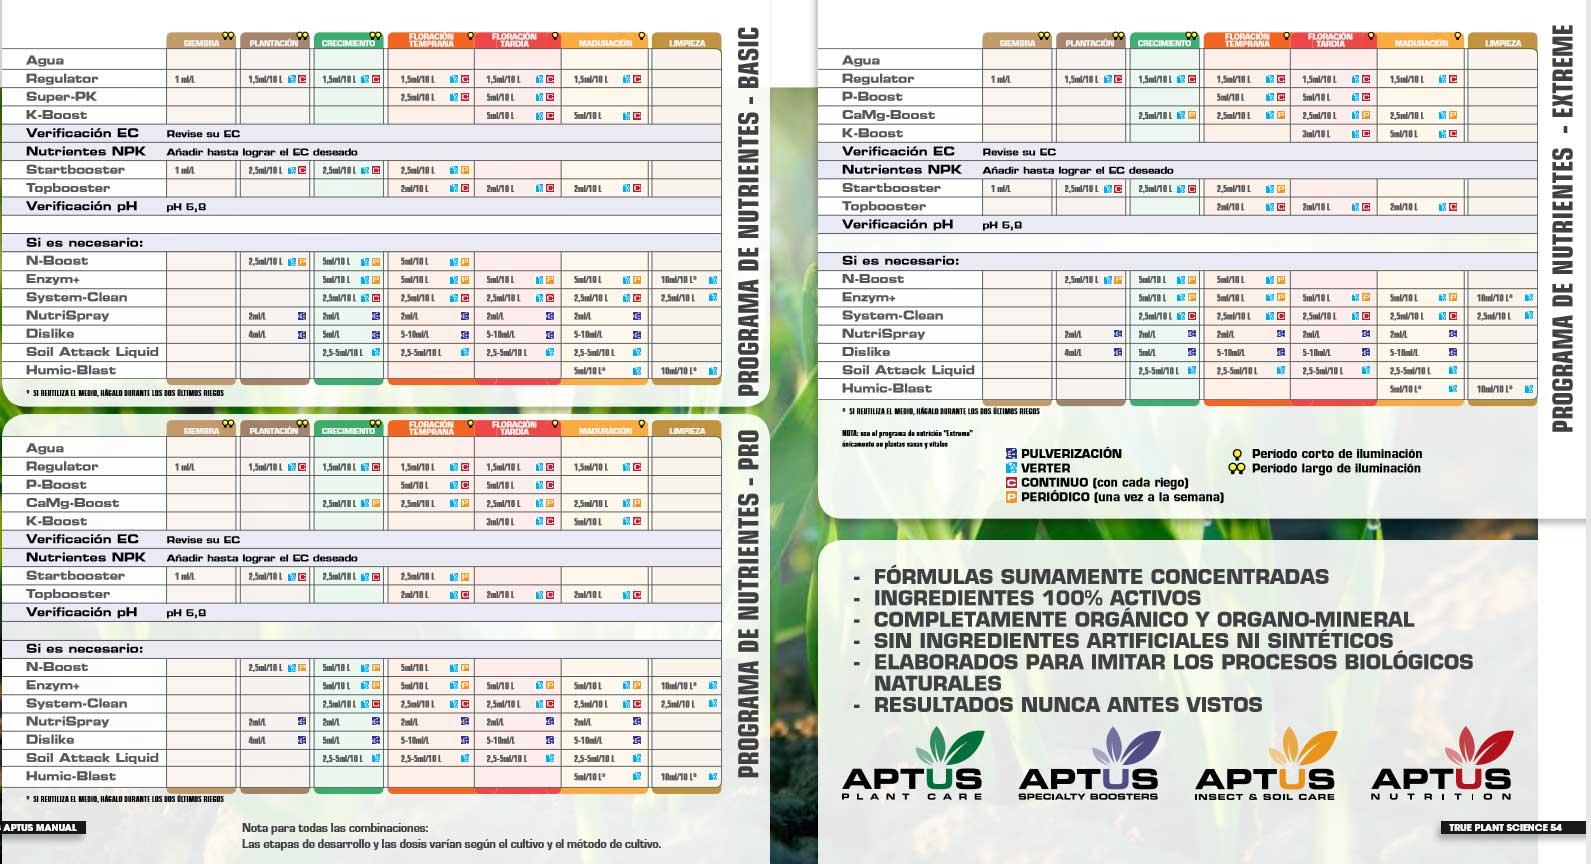 Tablas cultivo Aptus